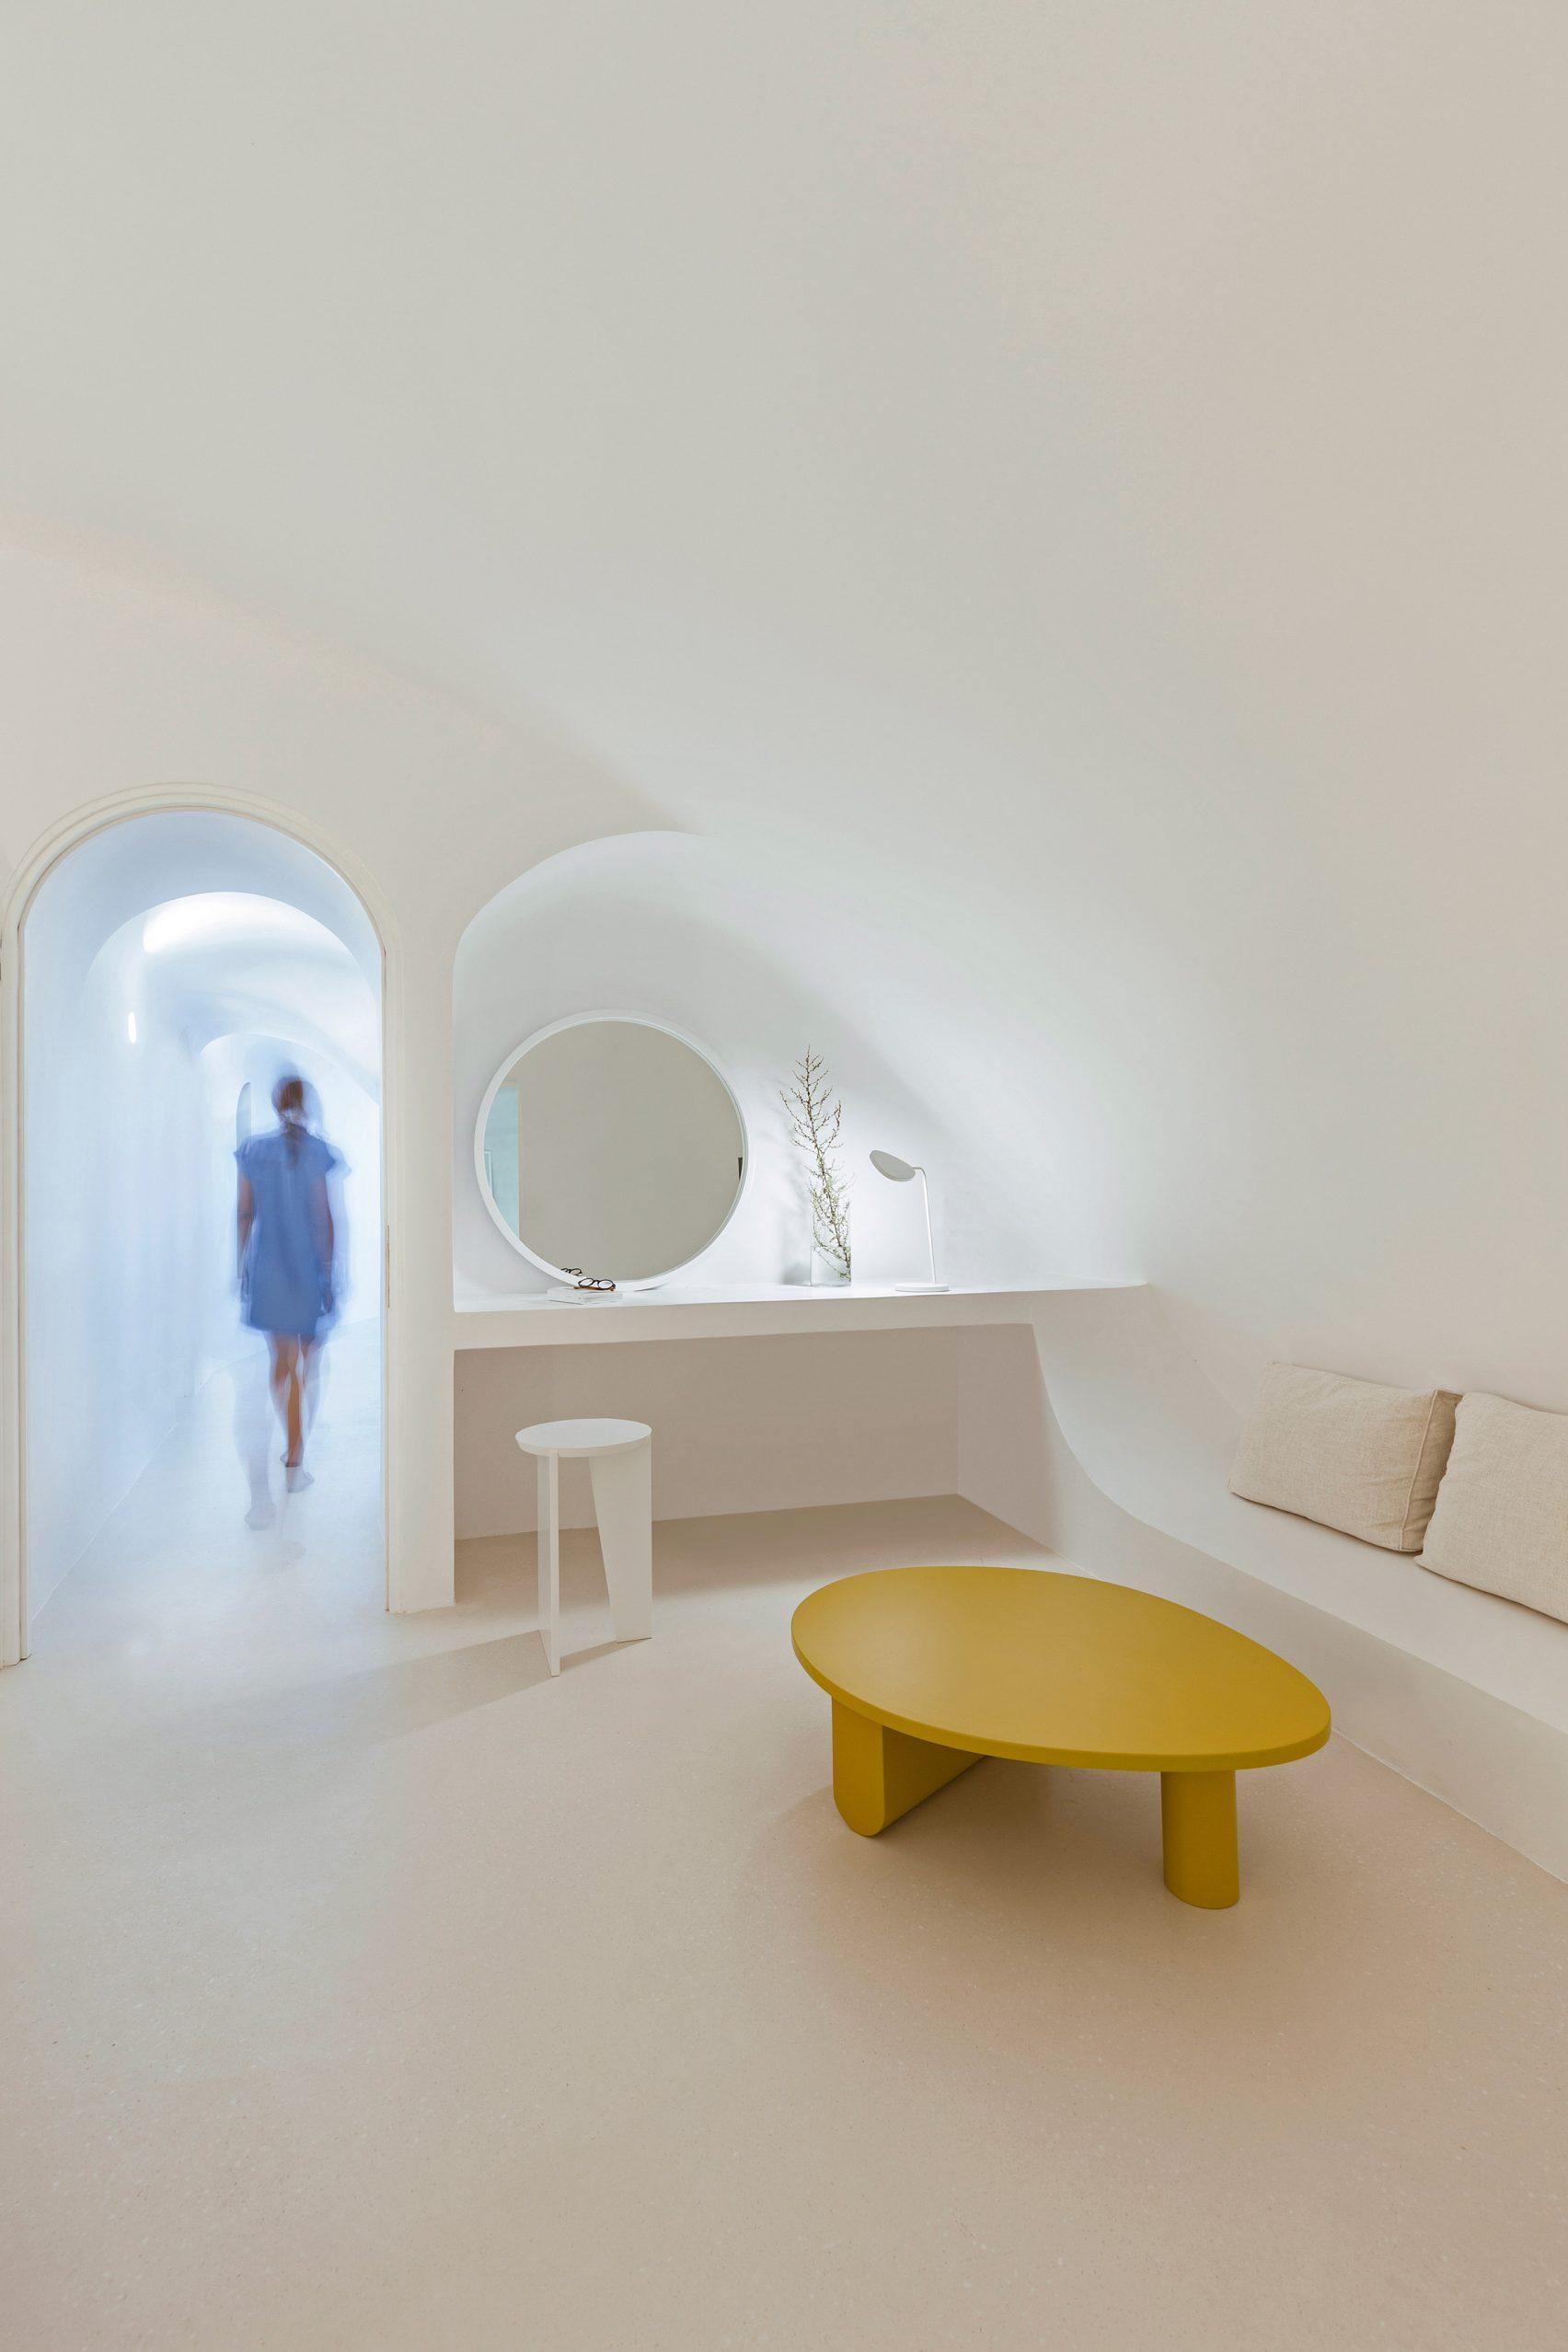 summer-residence-santorini-kapsimalis-architects-greece-architecture_dezeen_2364_col_10-1704x2556